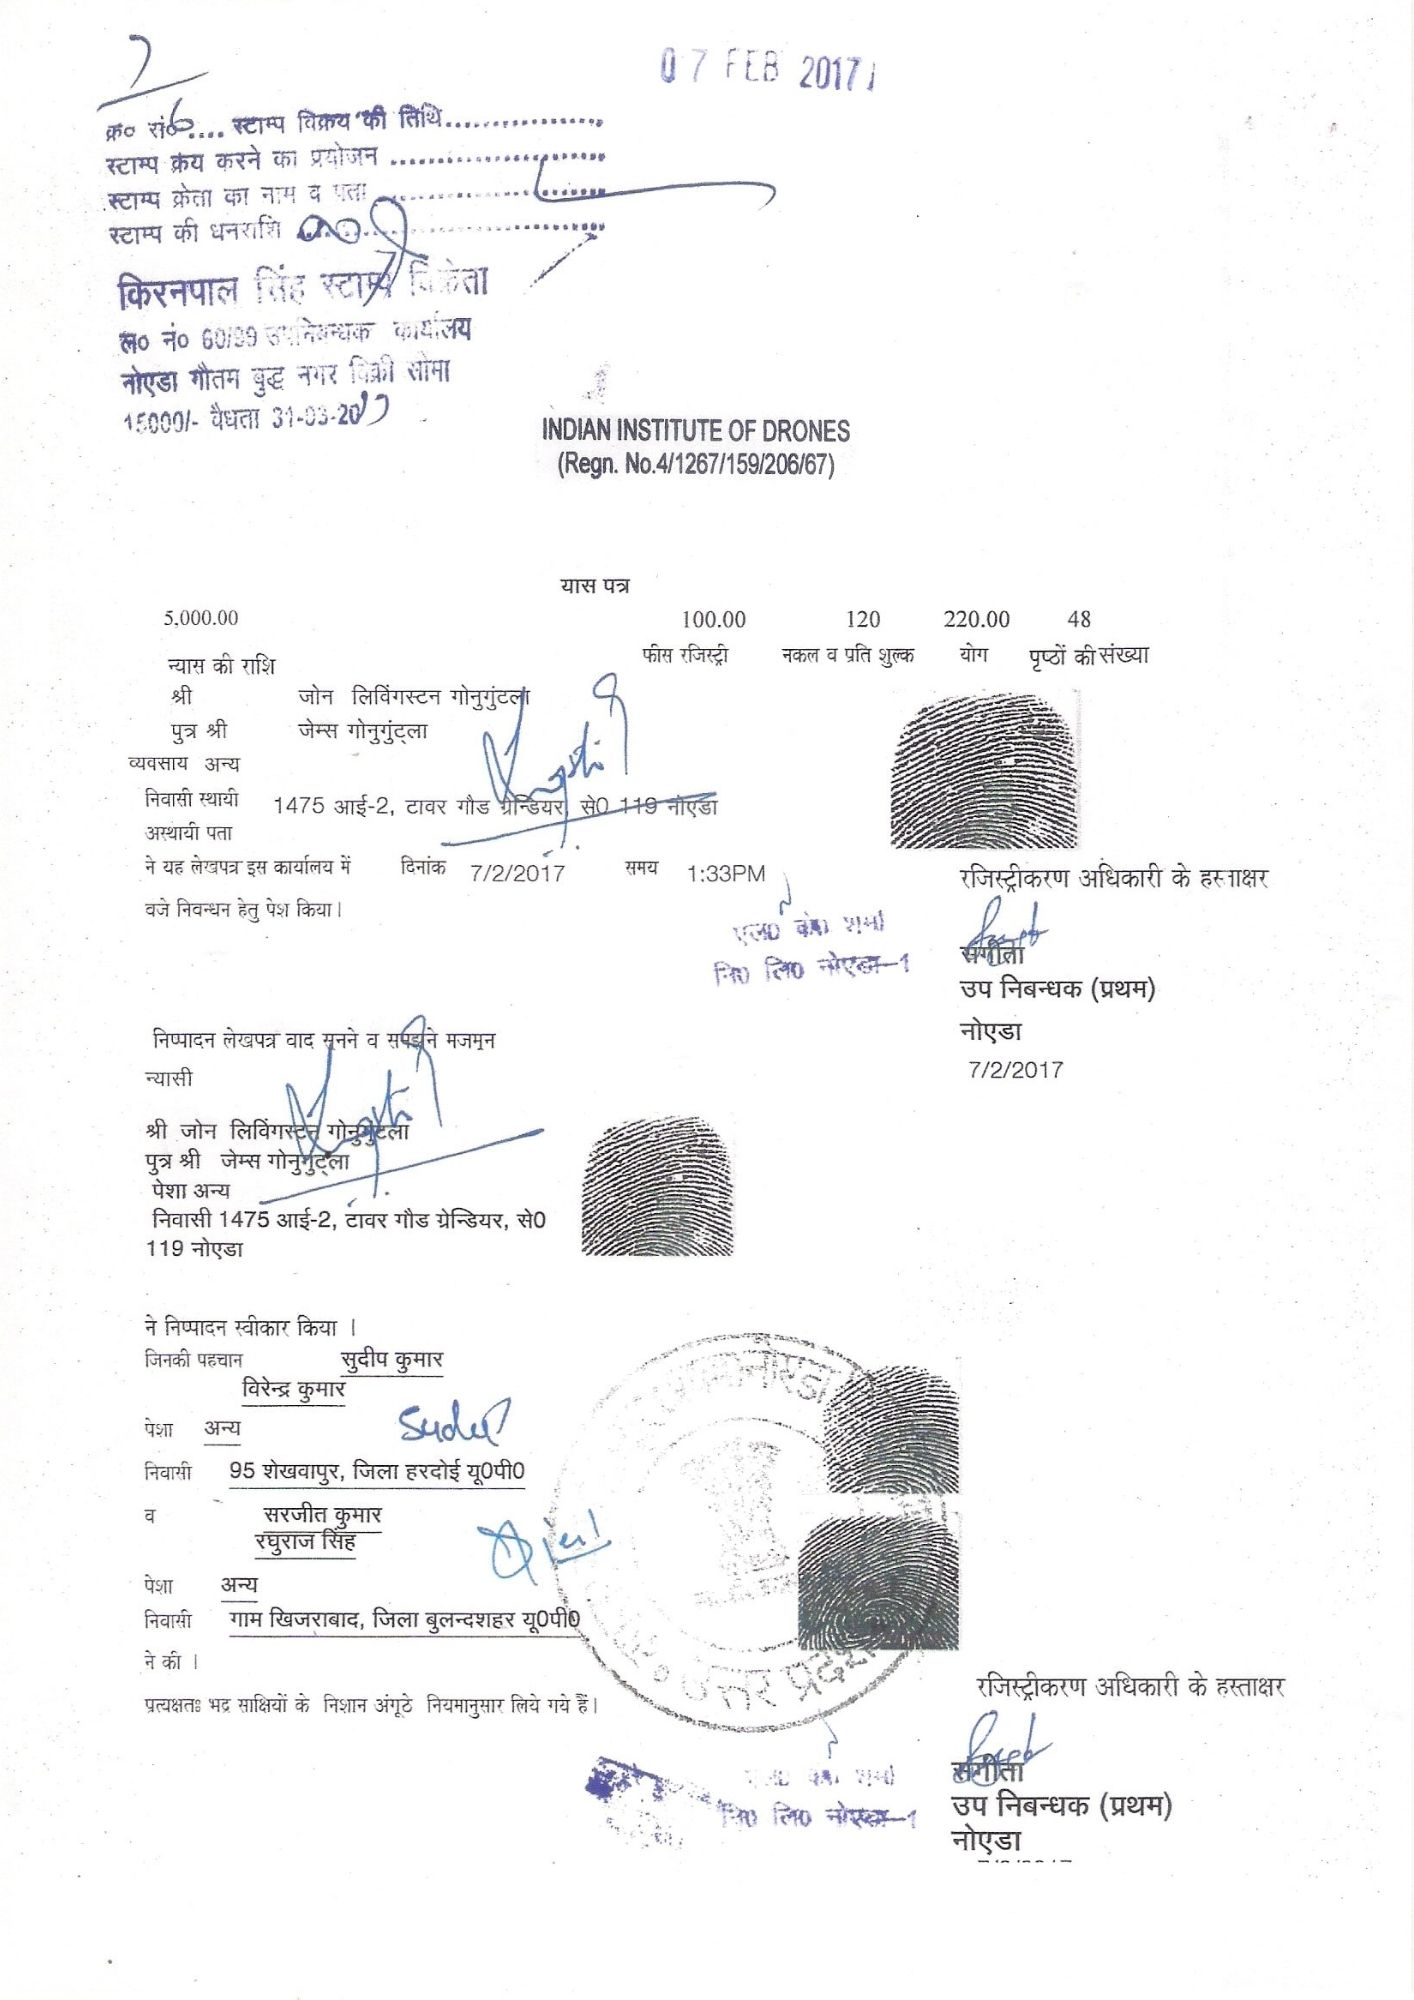 IID Registration Certificate